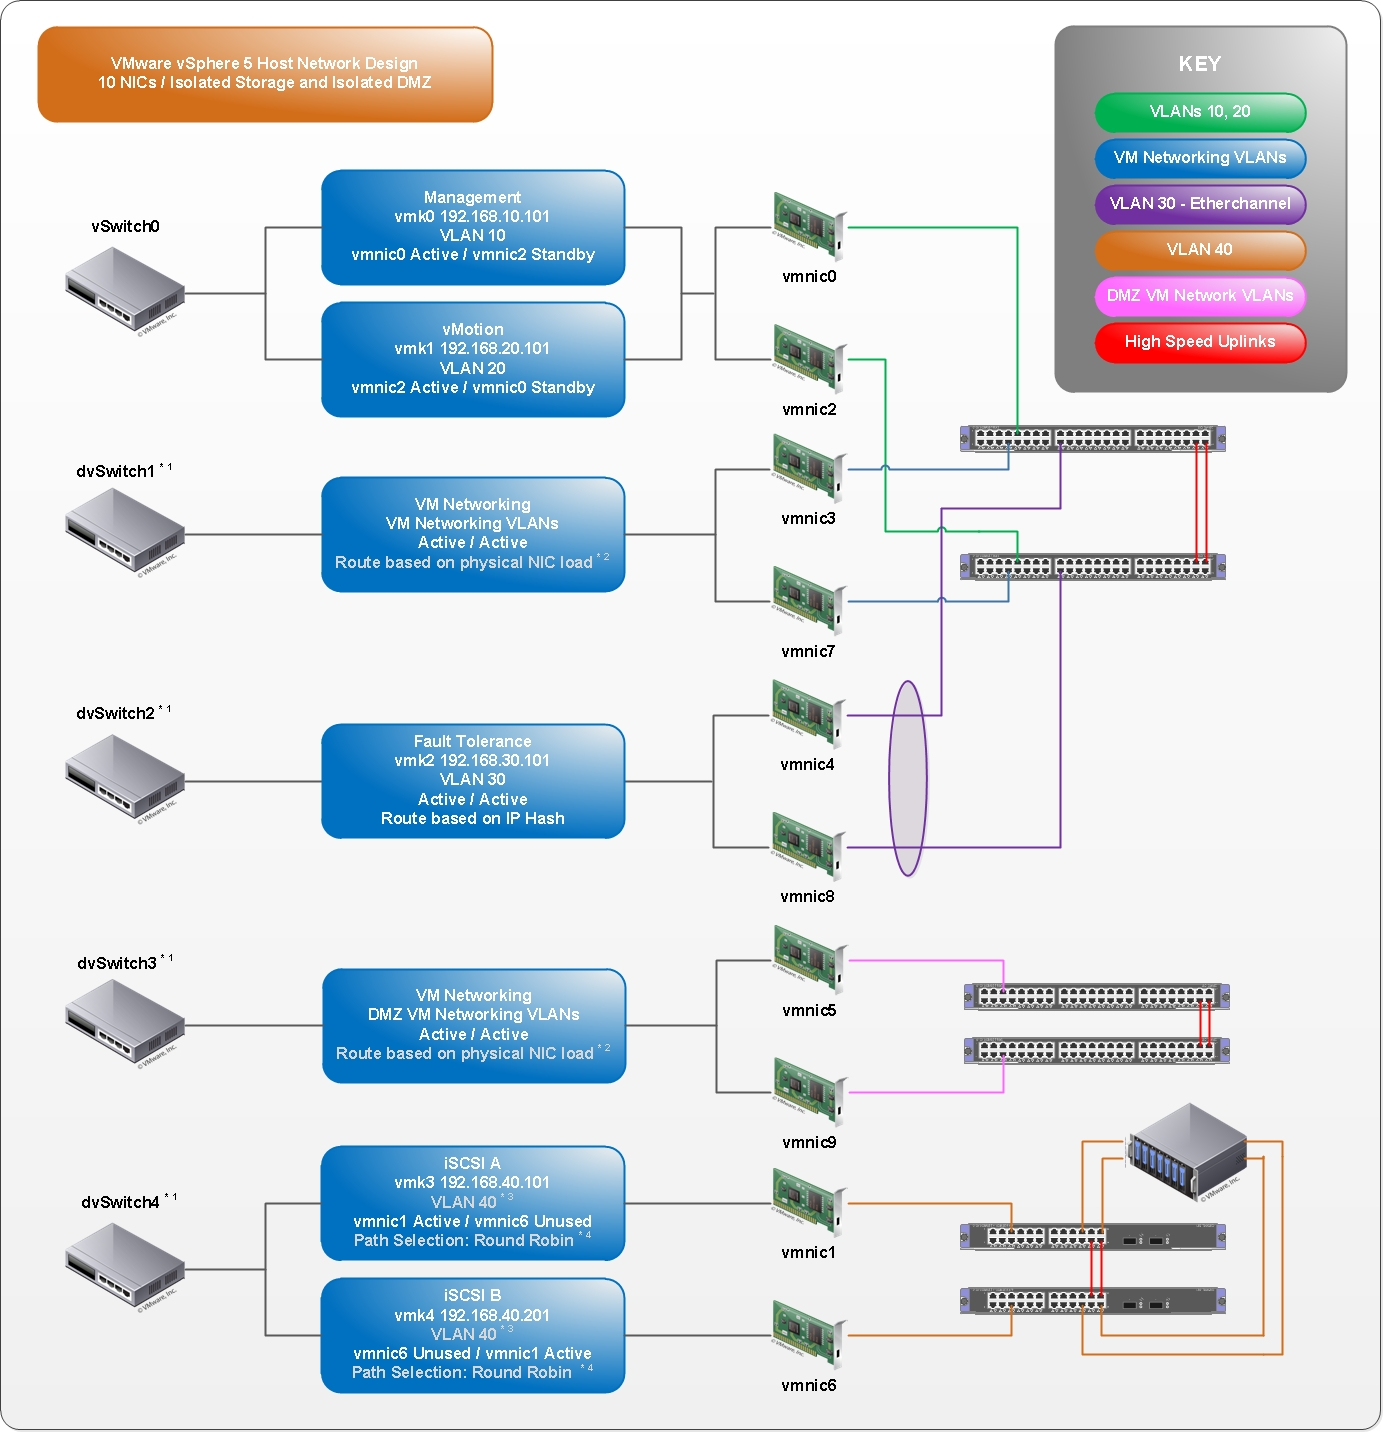 virtualization resistance is futile vsphere 5 host network vsphere 5 10 nics isolatedstorage and isolateddmz design v1 0 jpg